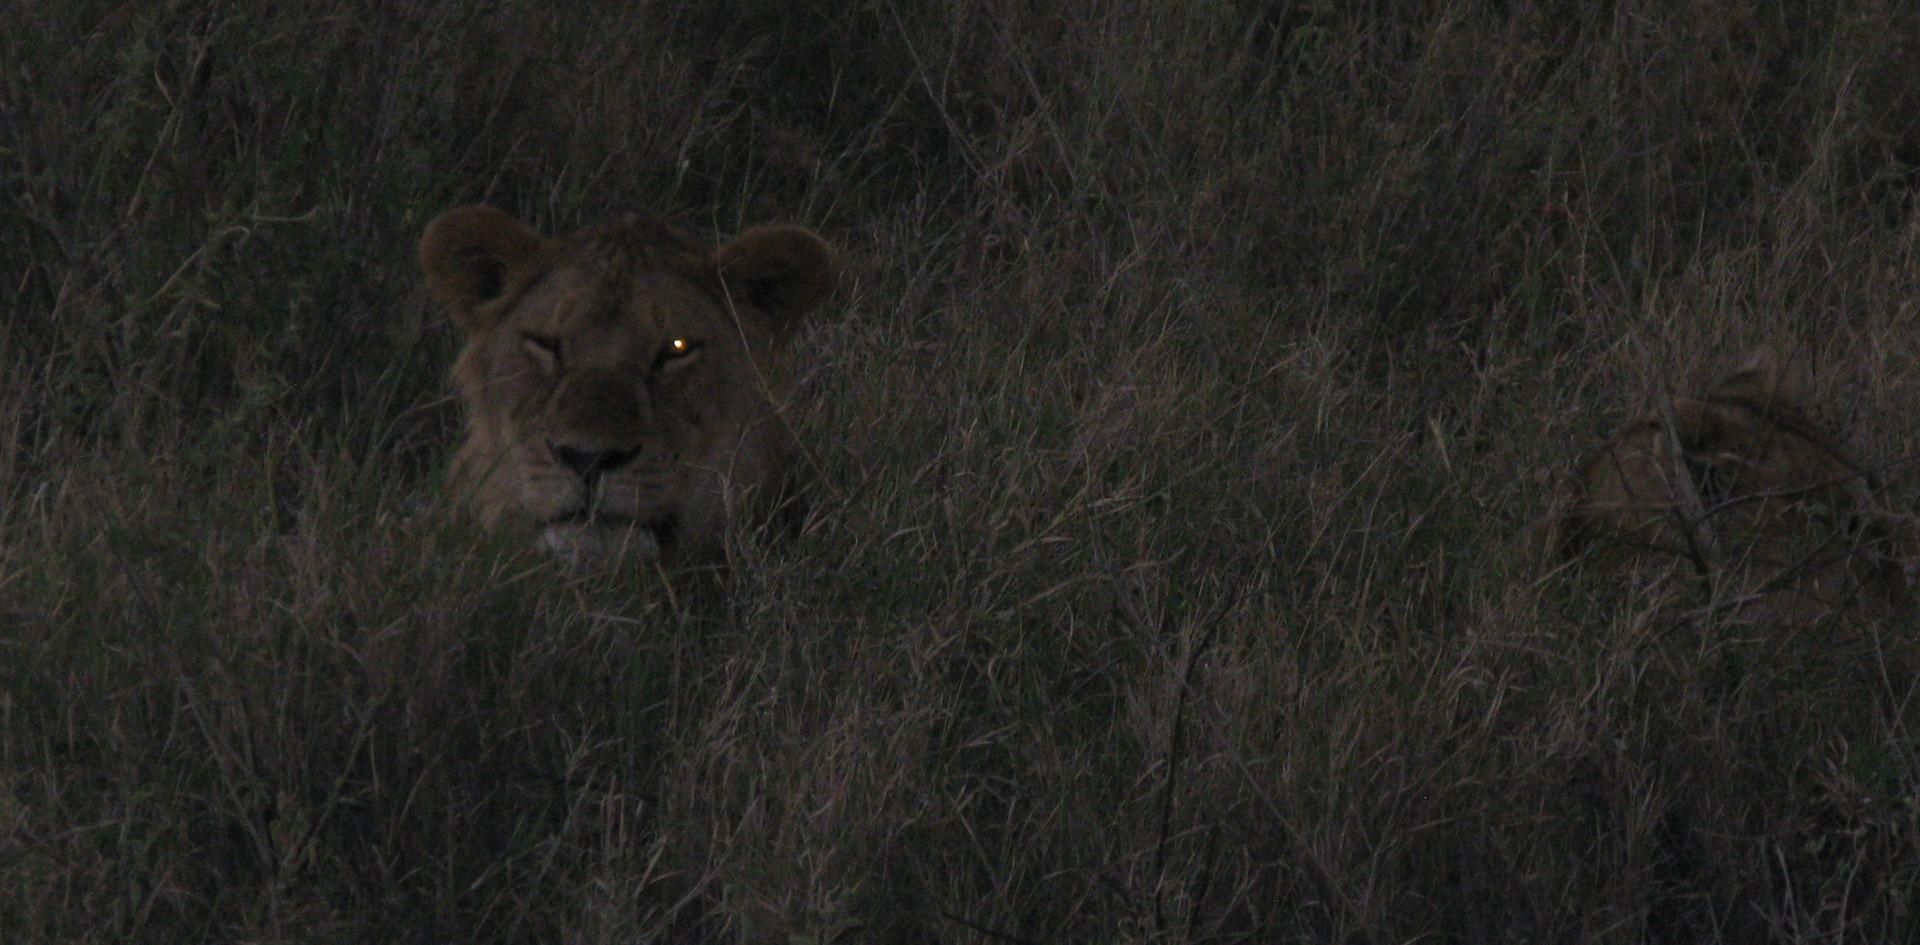 Serengeti Plains Tanzania